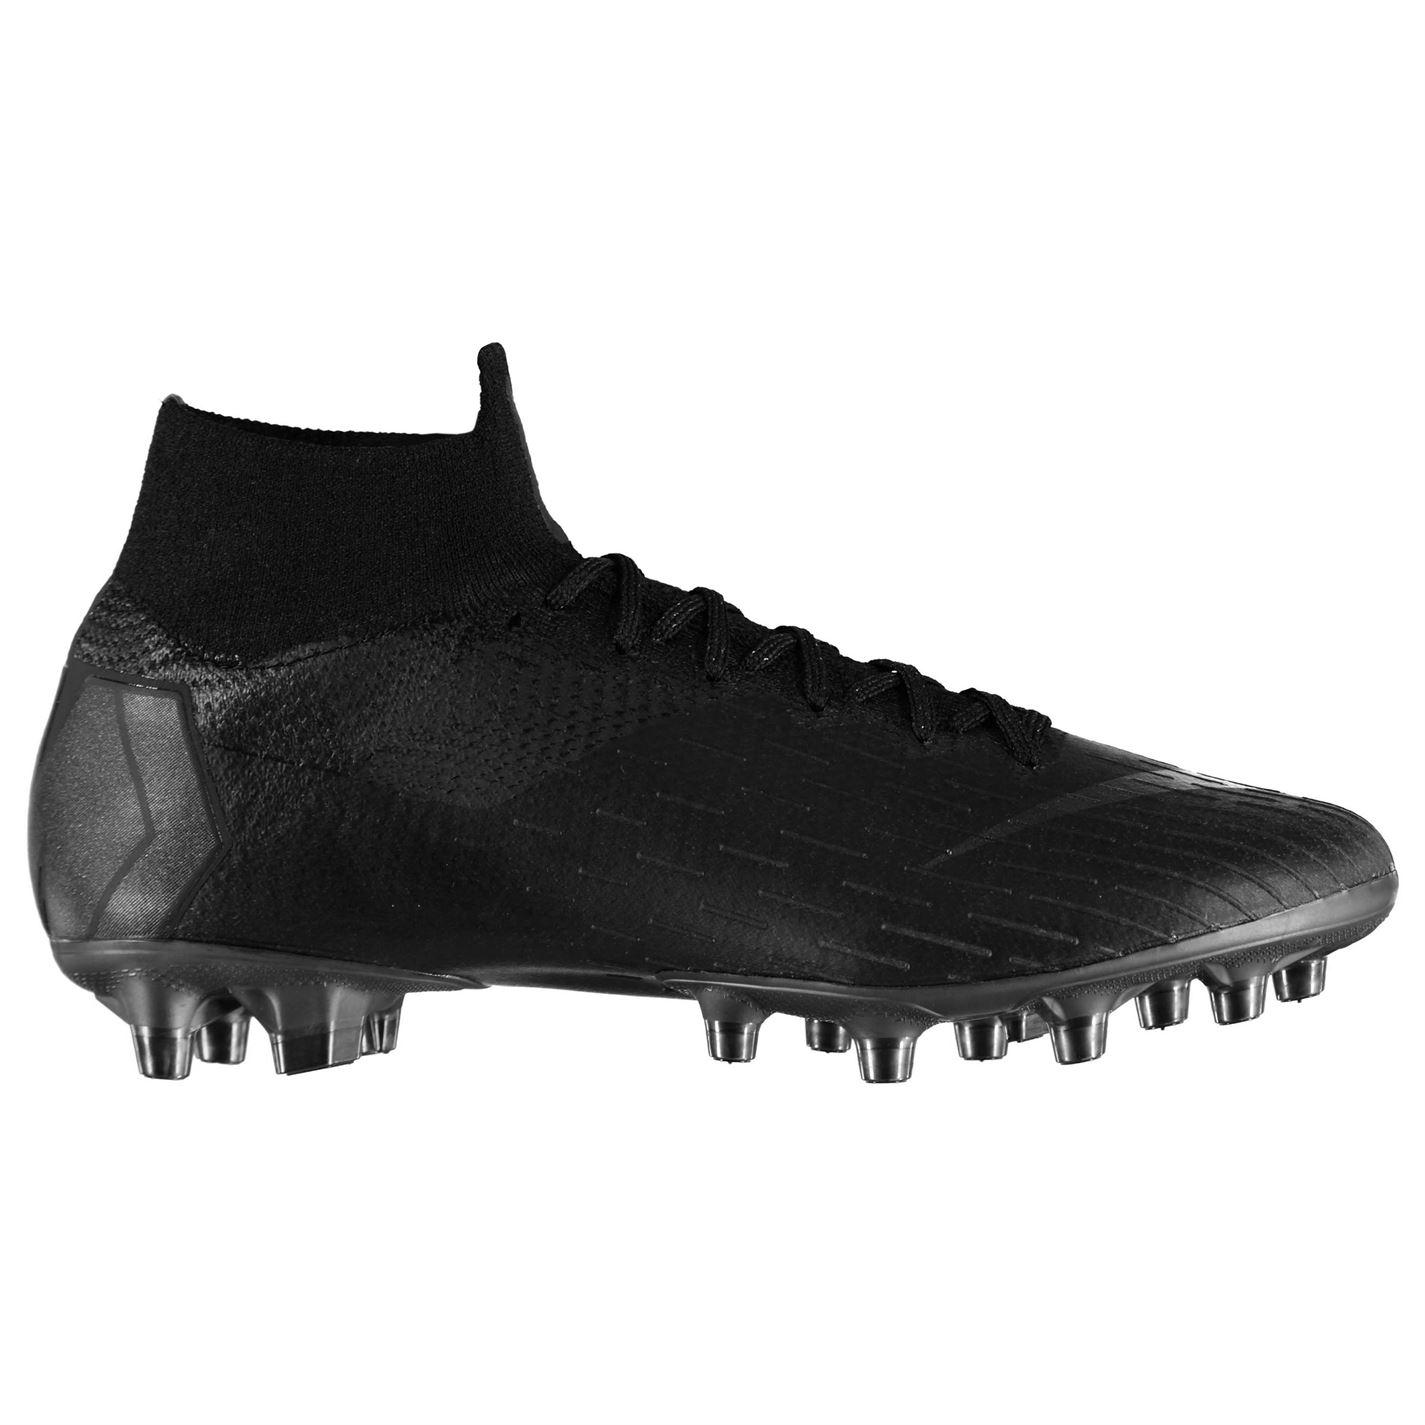 Nike Mercurial Superfly Elite DF Mens AG Football Boots